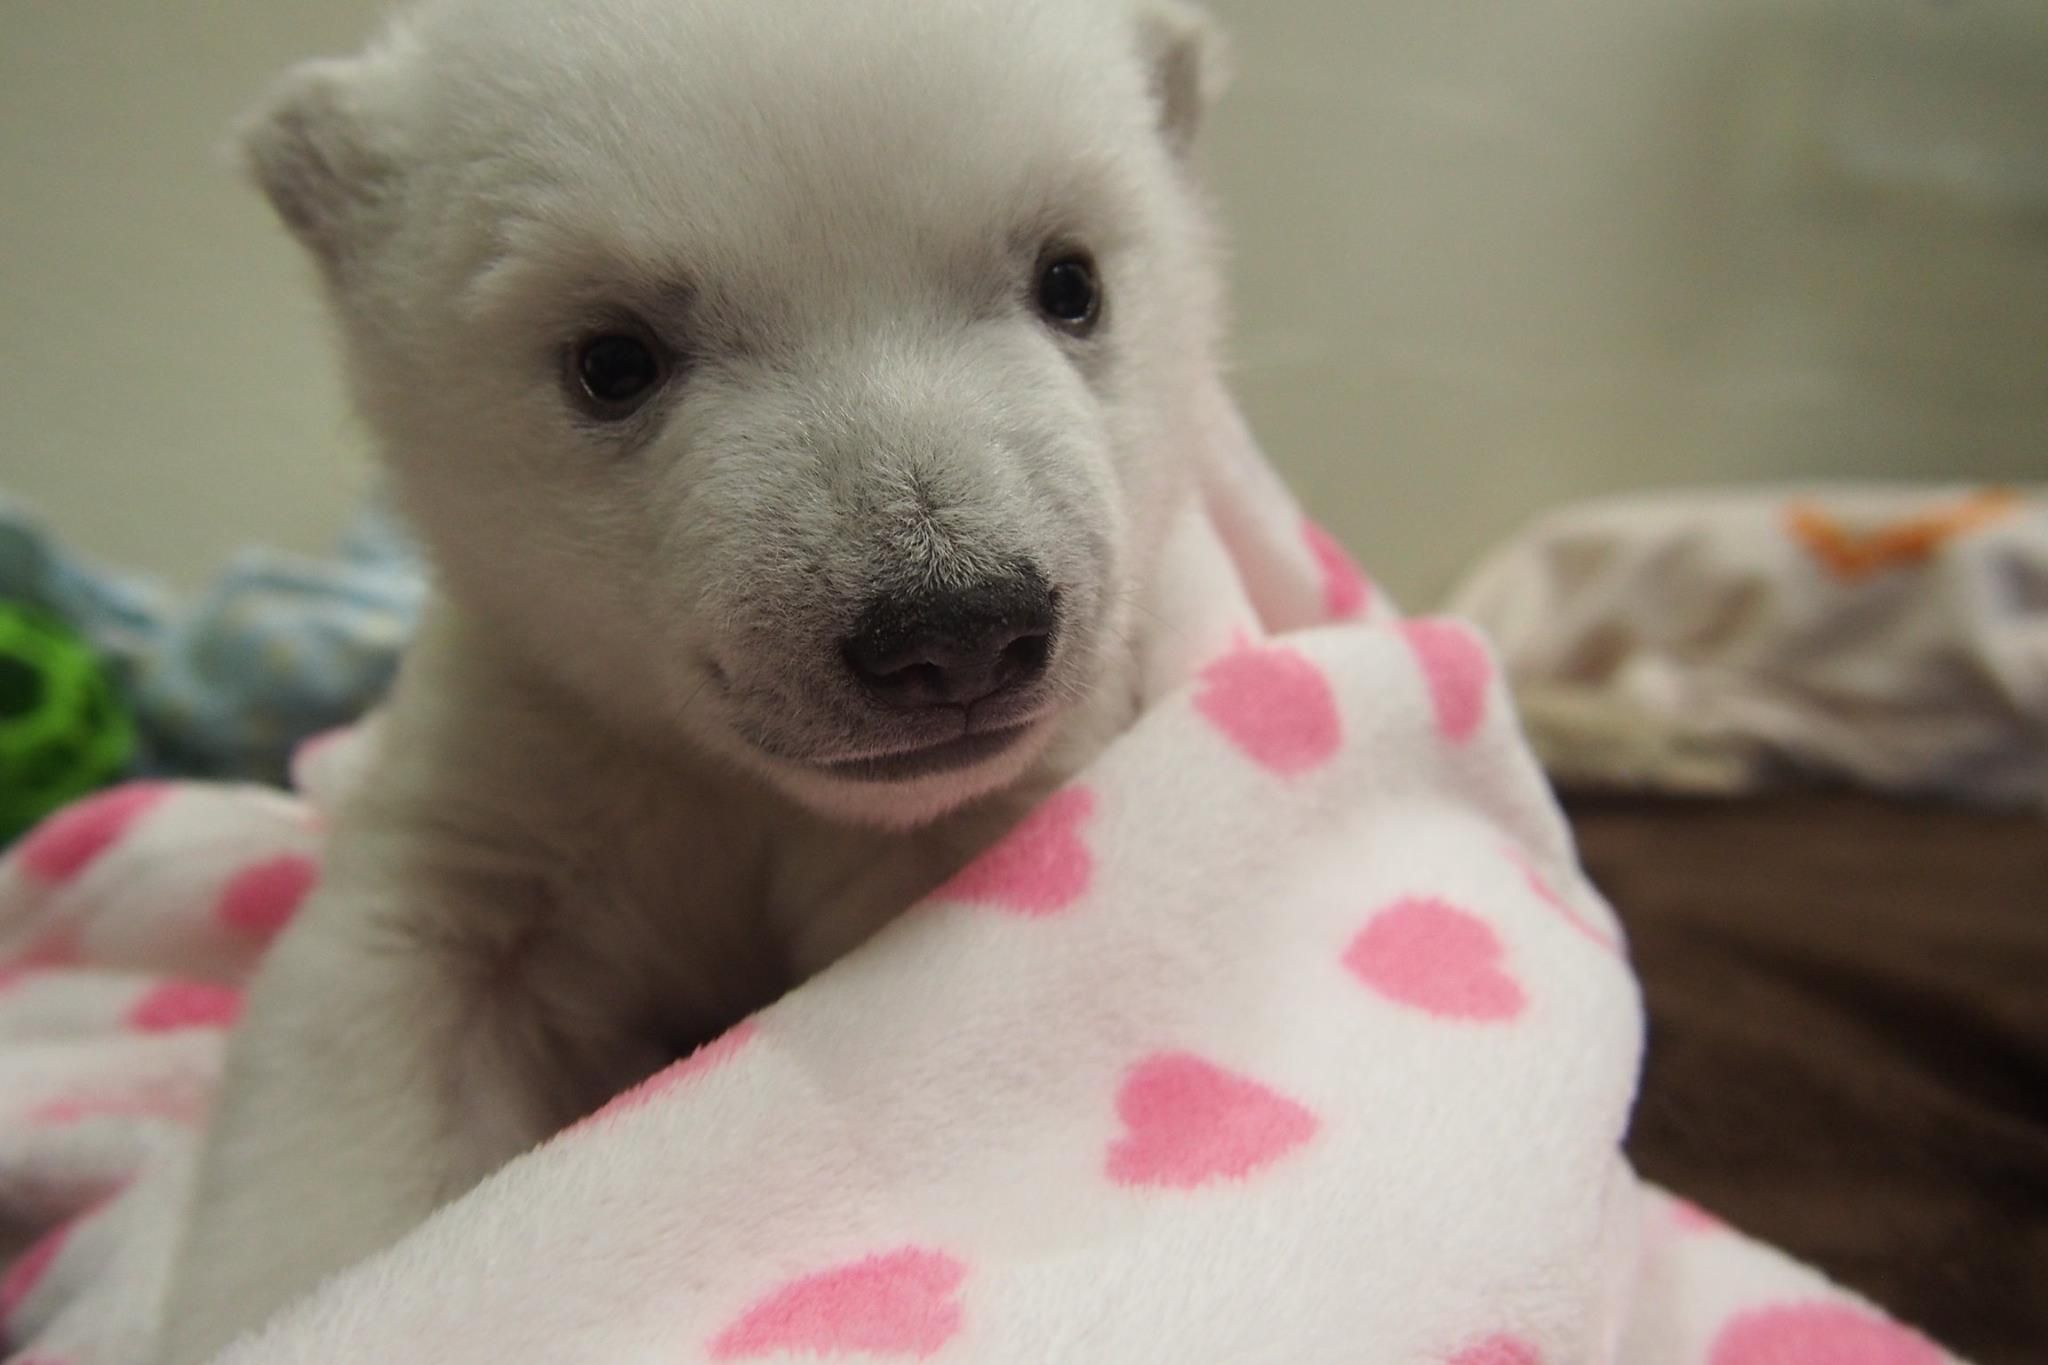 Toronto Zoo S Polar Bear Has Her Eyes Wide Open With Images Baby Polar Bears Toronto Zoo Polar Bear